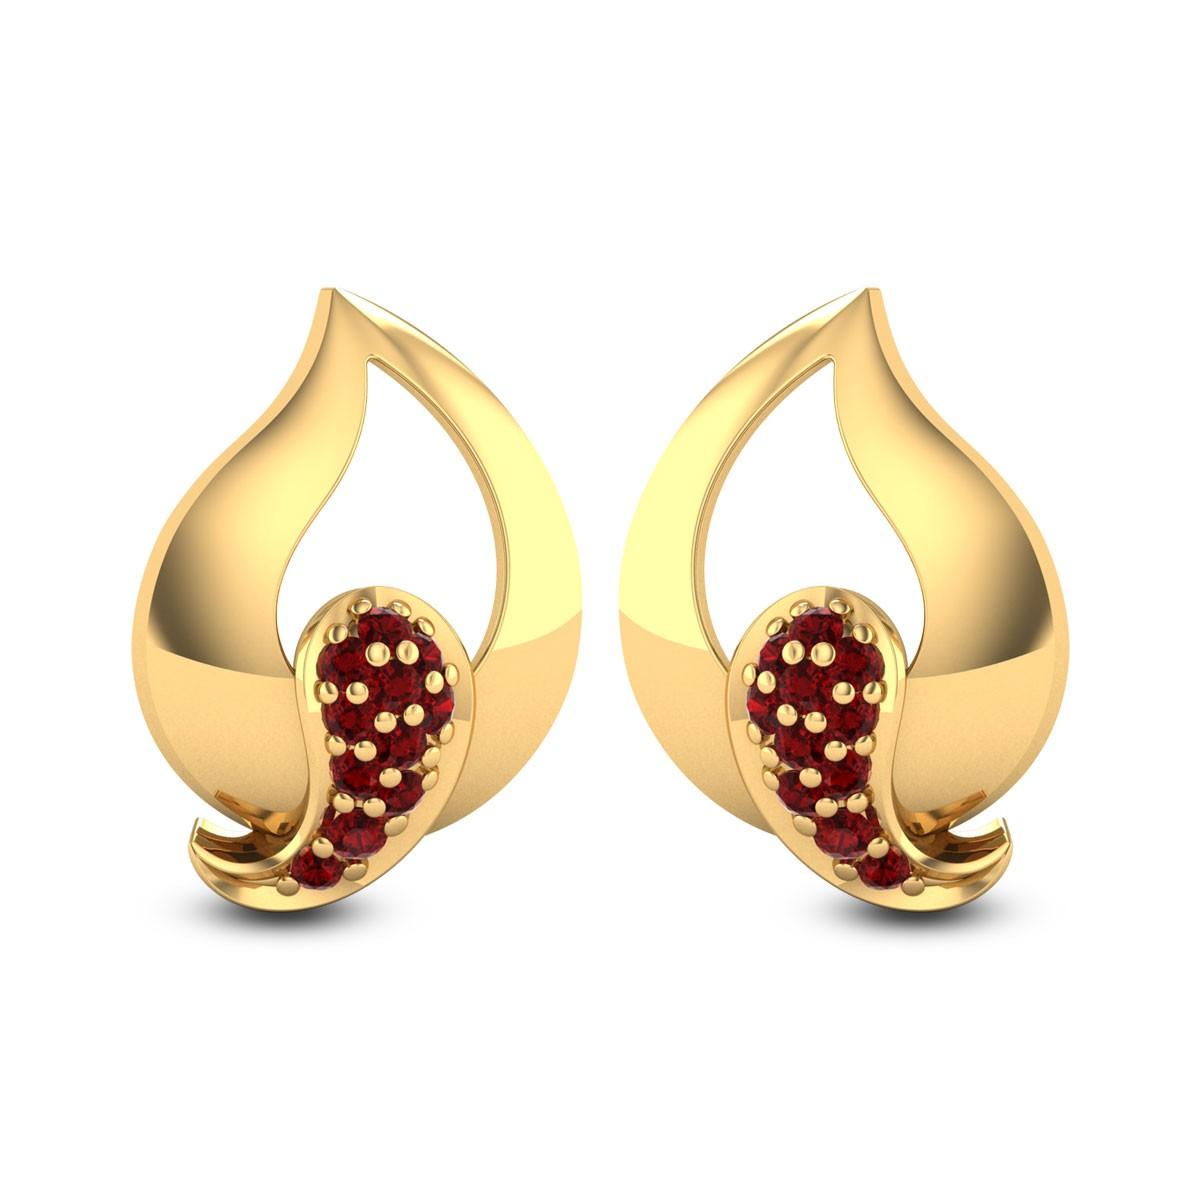 Dianthus Ruby Stud Earrings